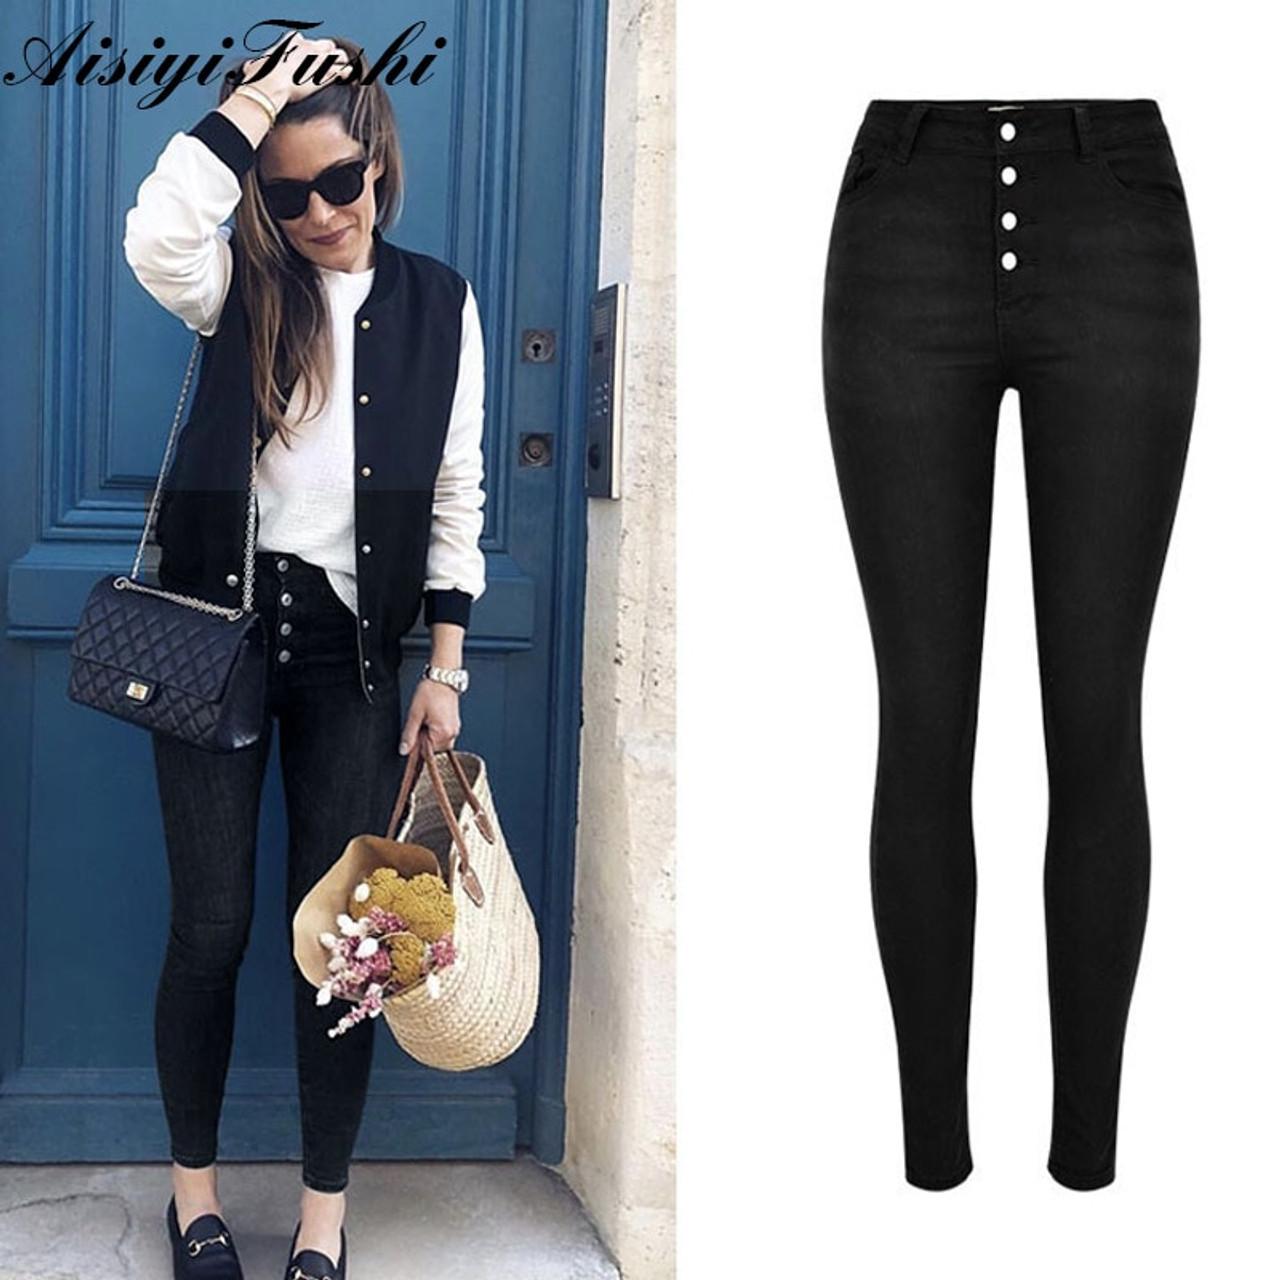 d9c67c74b077e ... Black Jeans Woman High Waist Push Up Stretch Denim Ladies Jeans Black  Women's Trousers Skinny Pants ...